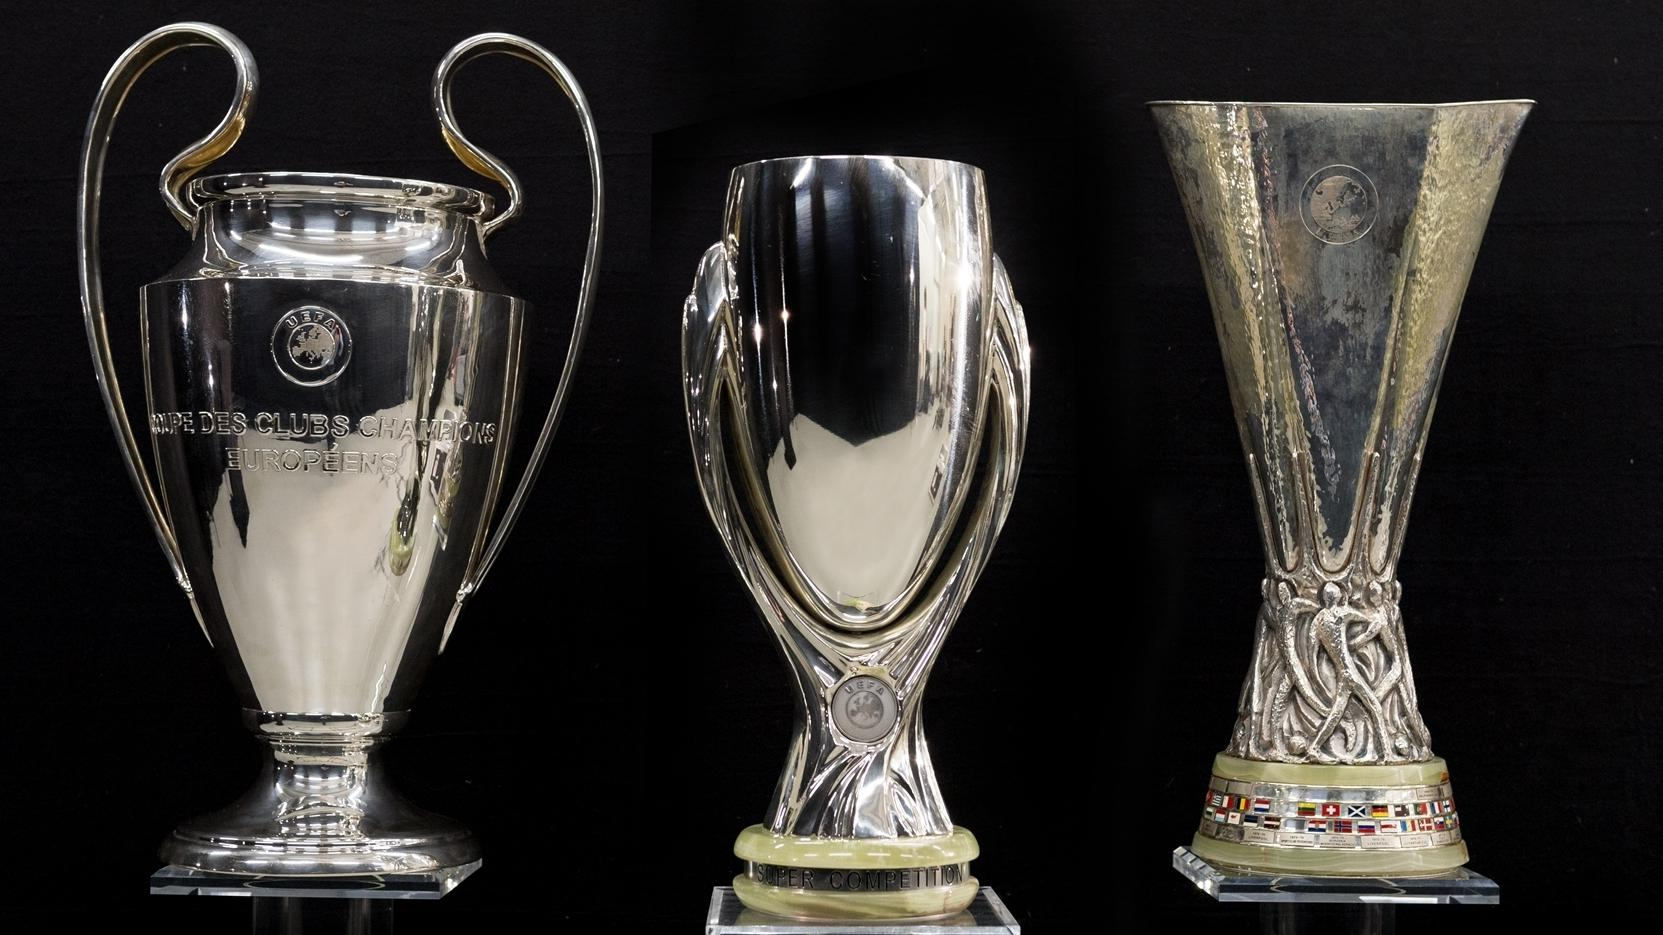 2019 20 uefa club competitions revenue distribution system inside uefa uefa com 2019 20 uefa club competitions revenue